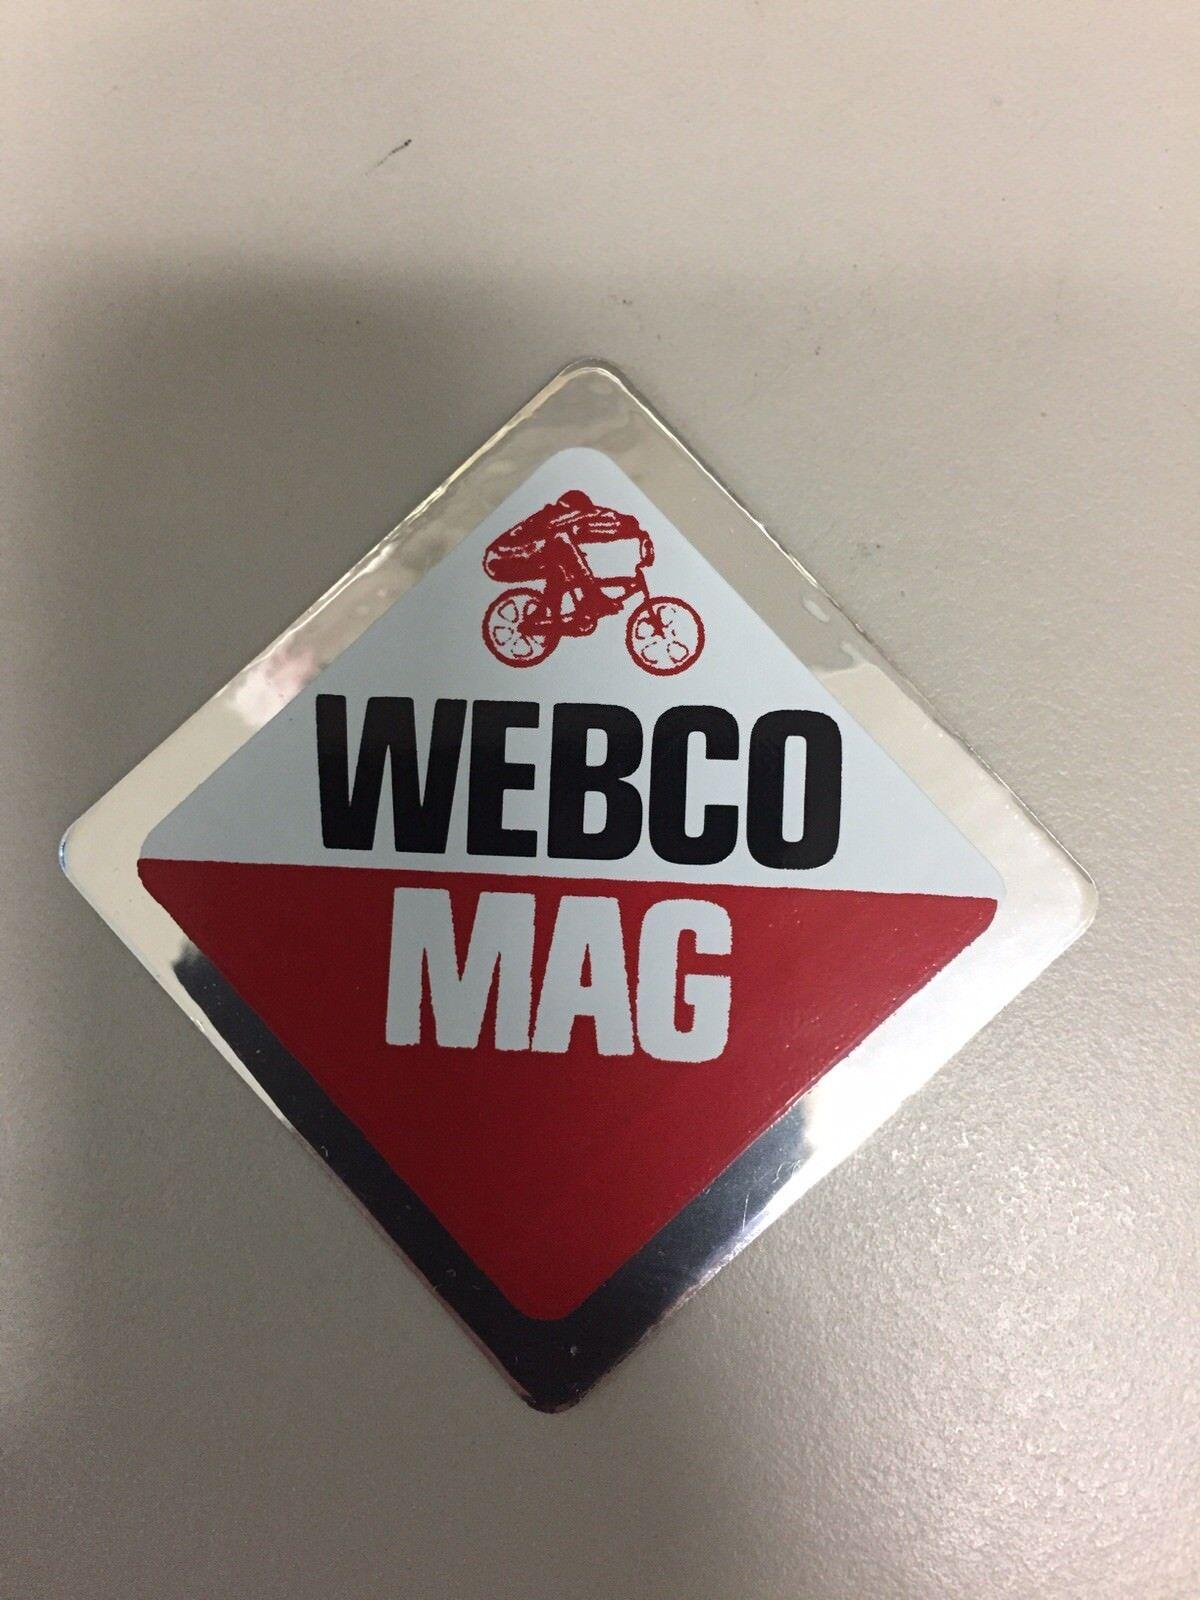 Original NOS Webco MAG Wheels Bicycle Decal From Old Webco Inventory